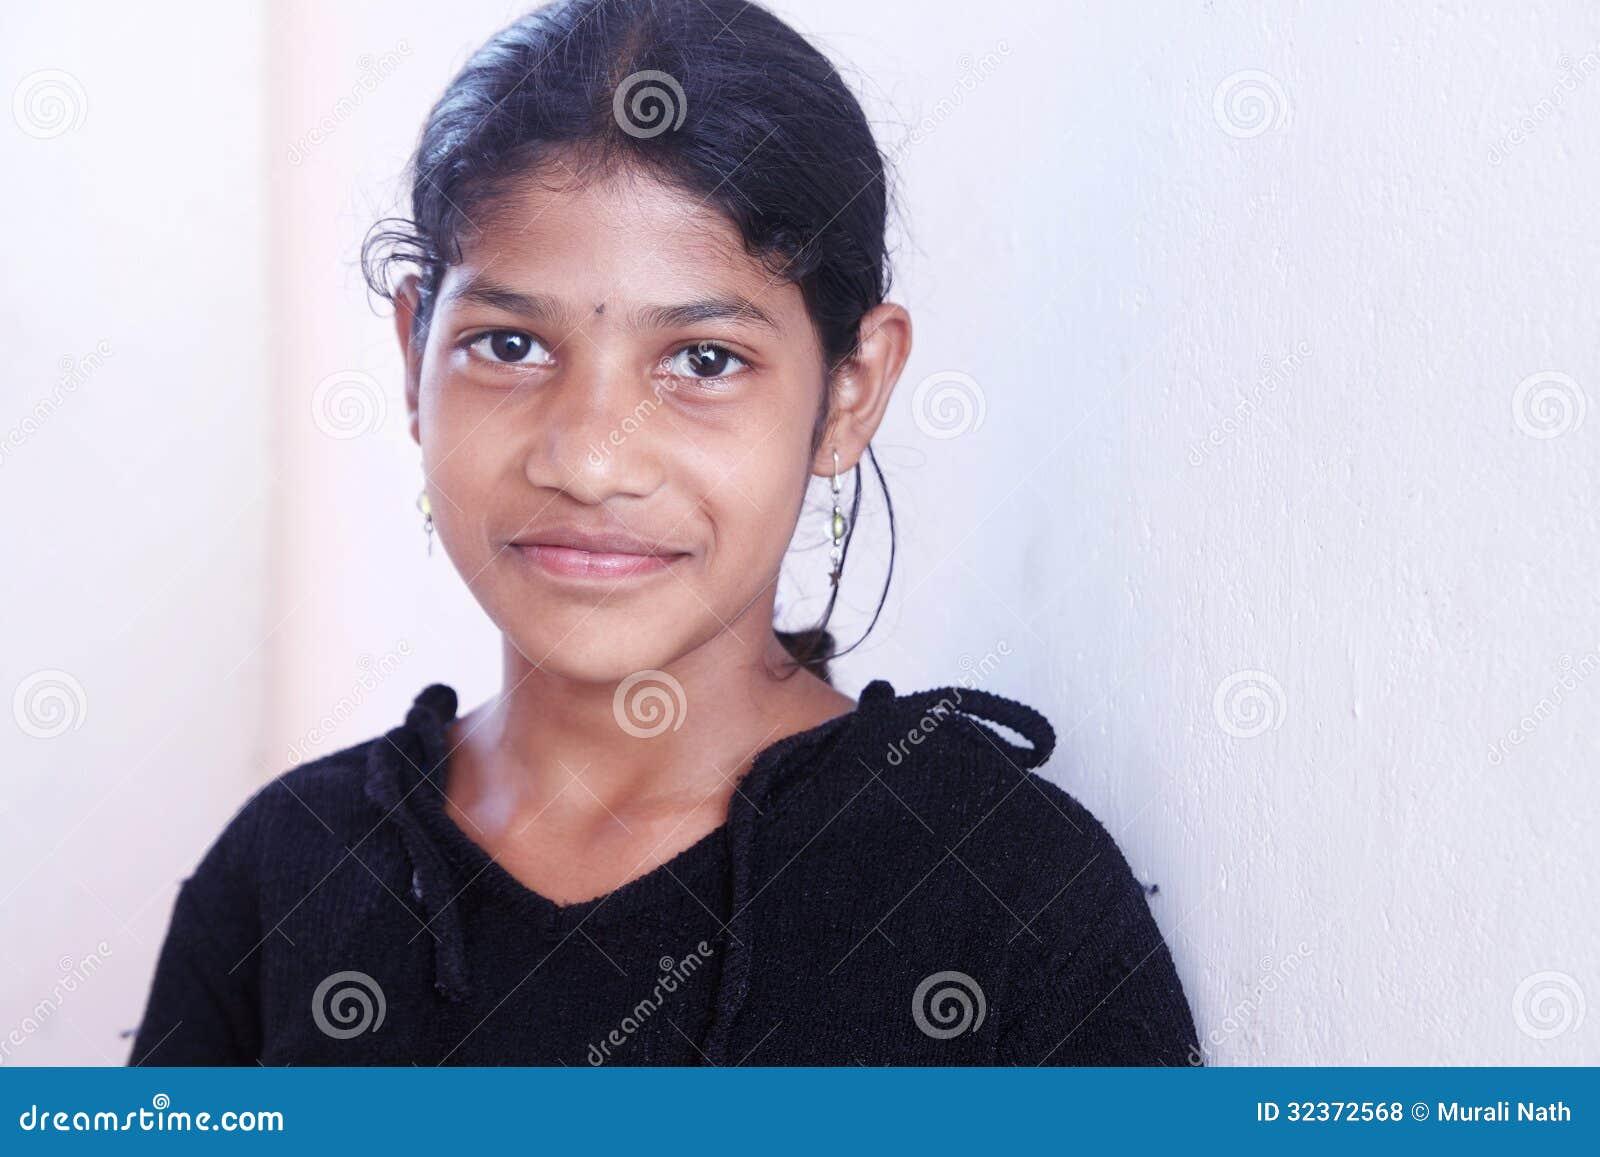 Smiling Indian Village Girl Royalty Free Stock Photos - Image 32372568-8347